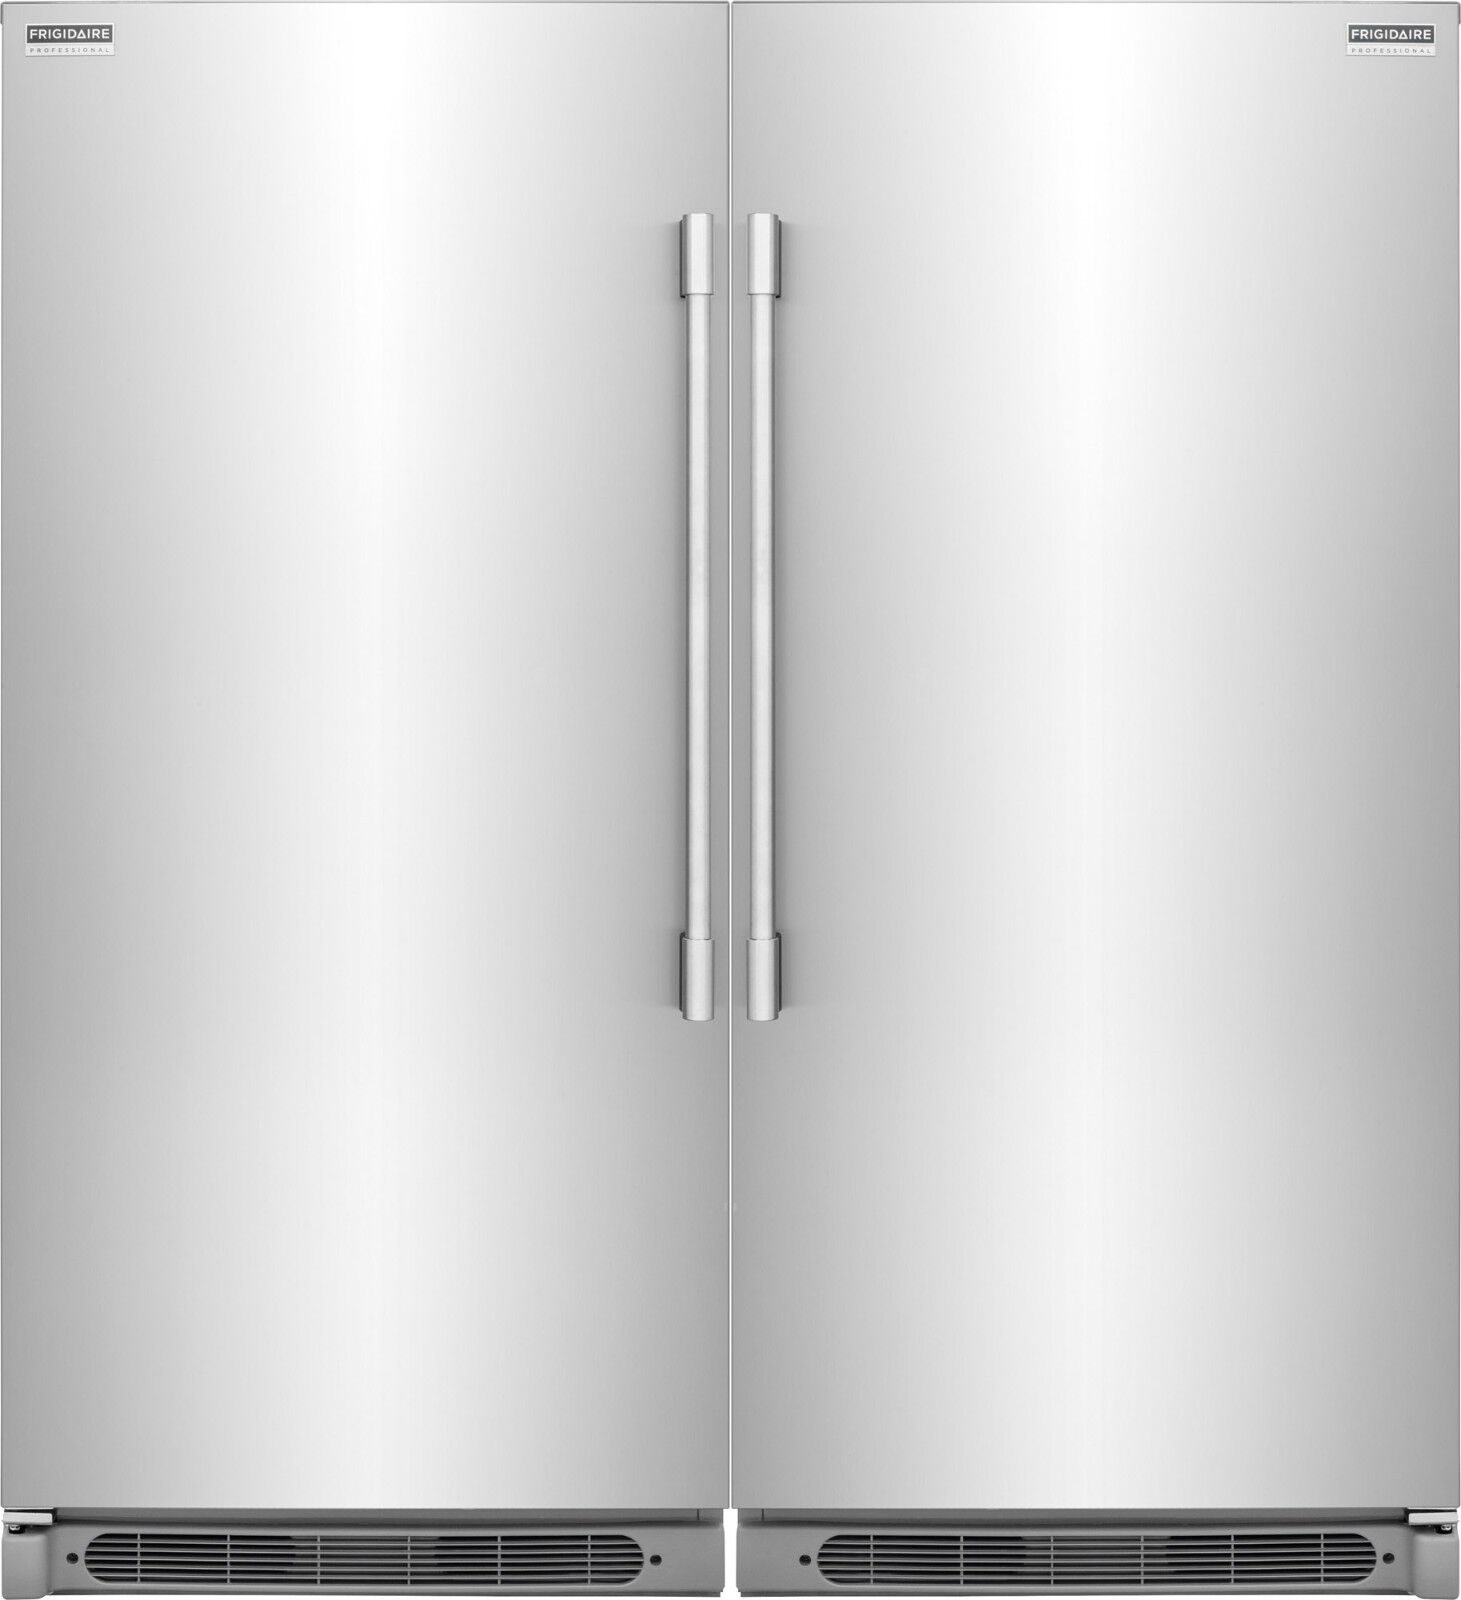 Frigidaire PRO Stainless Refrigerator & Freezer Combo